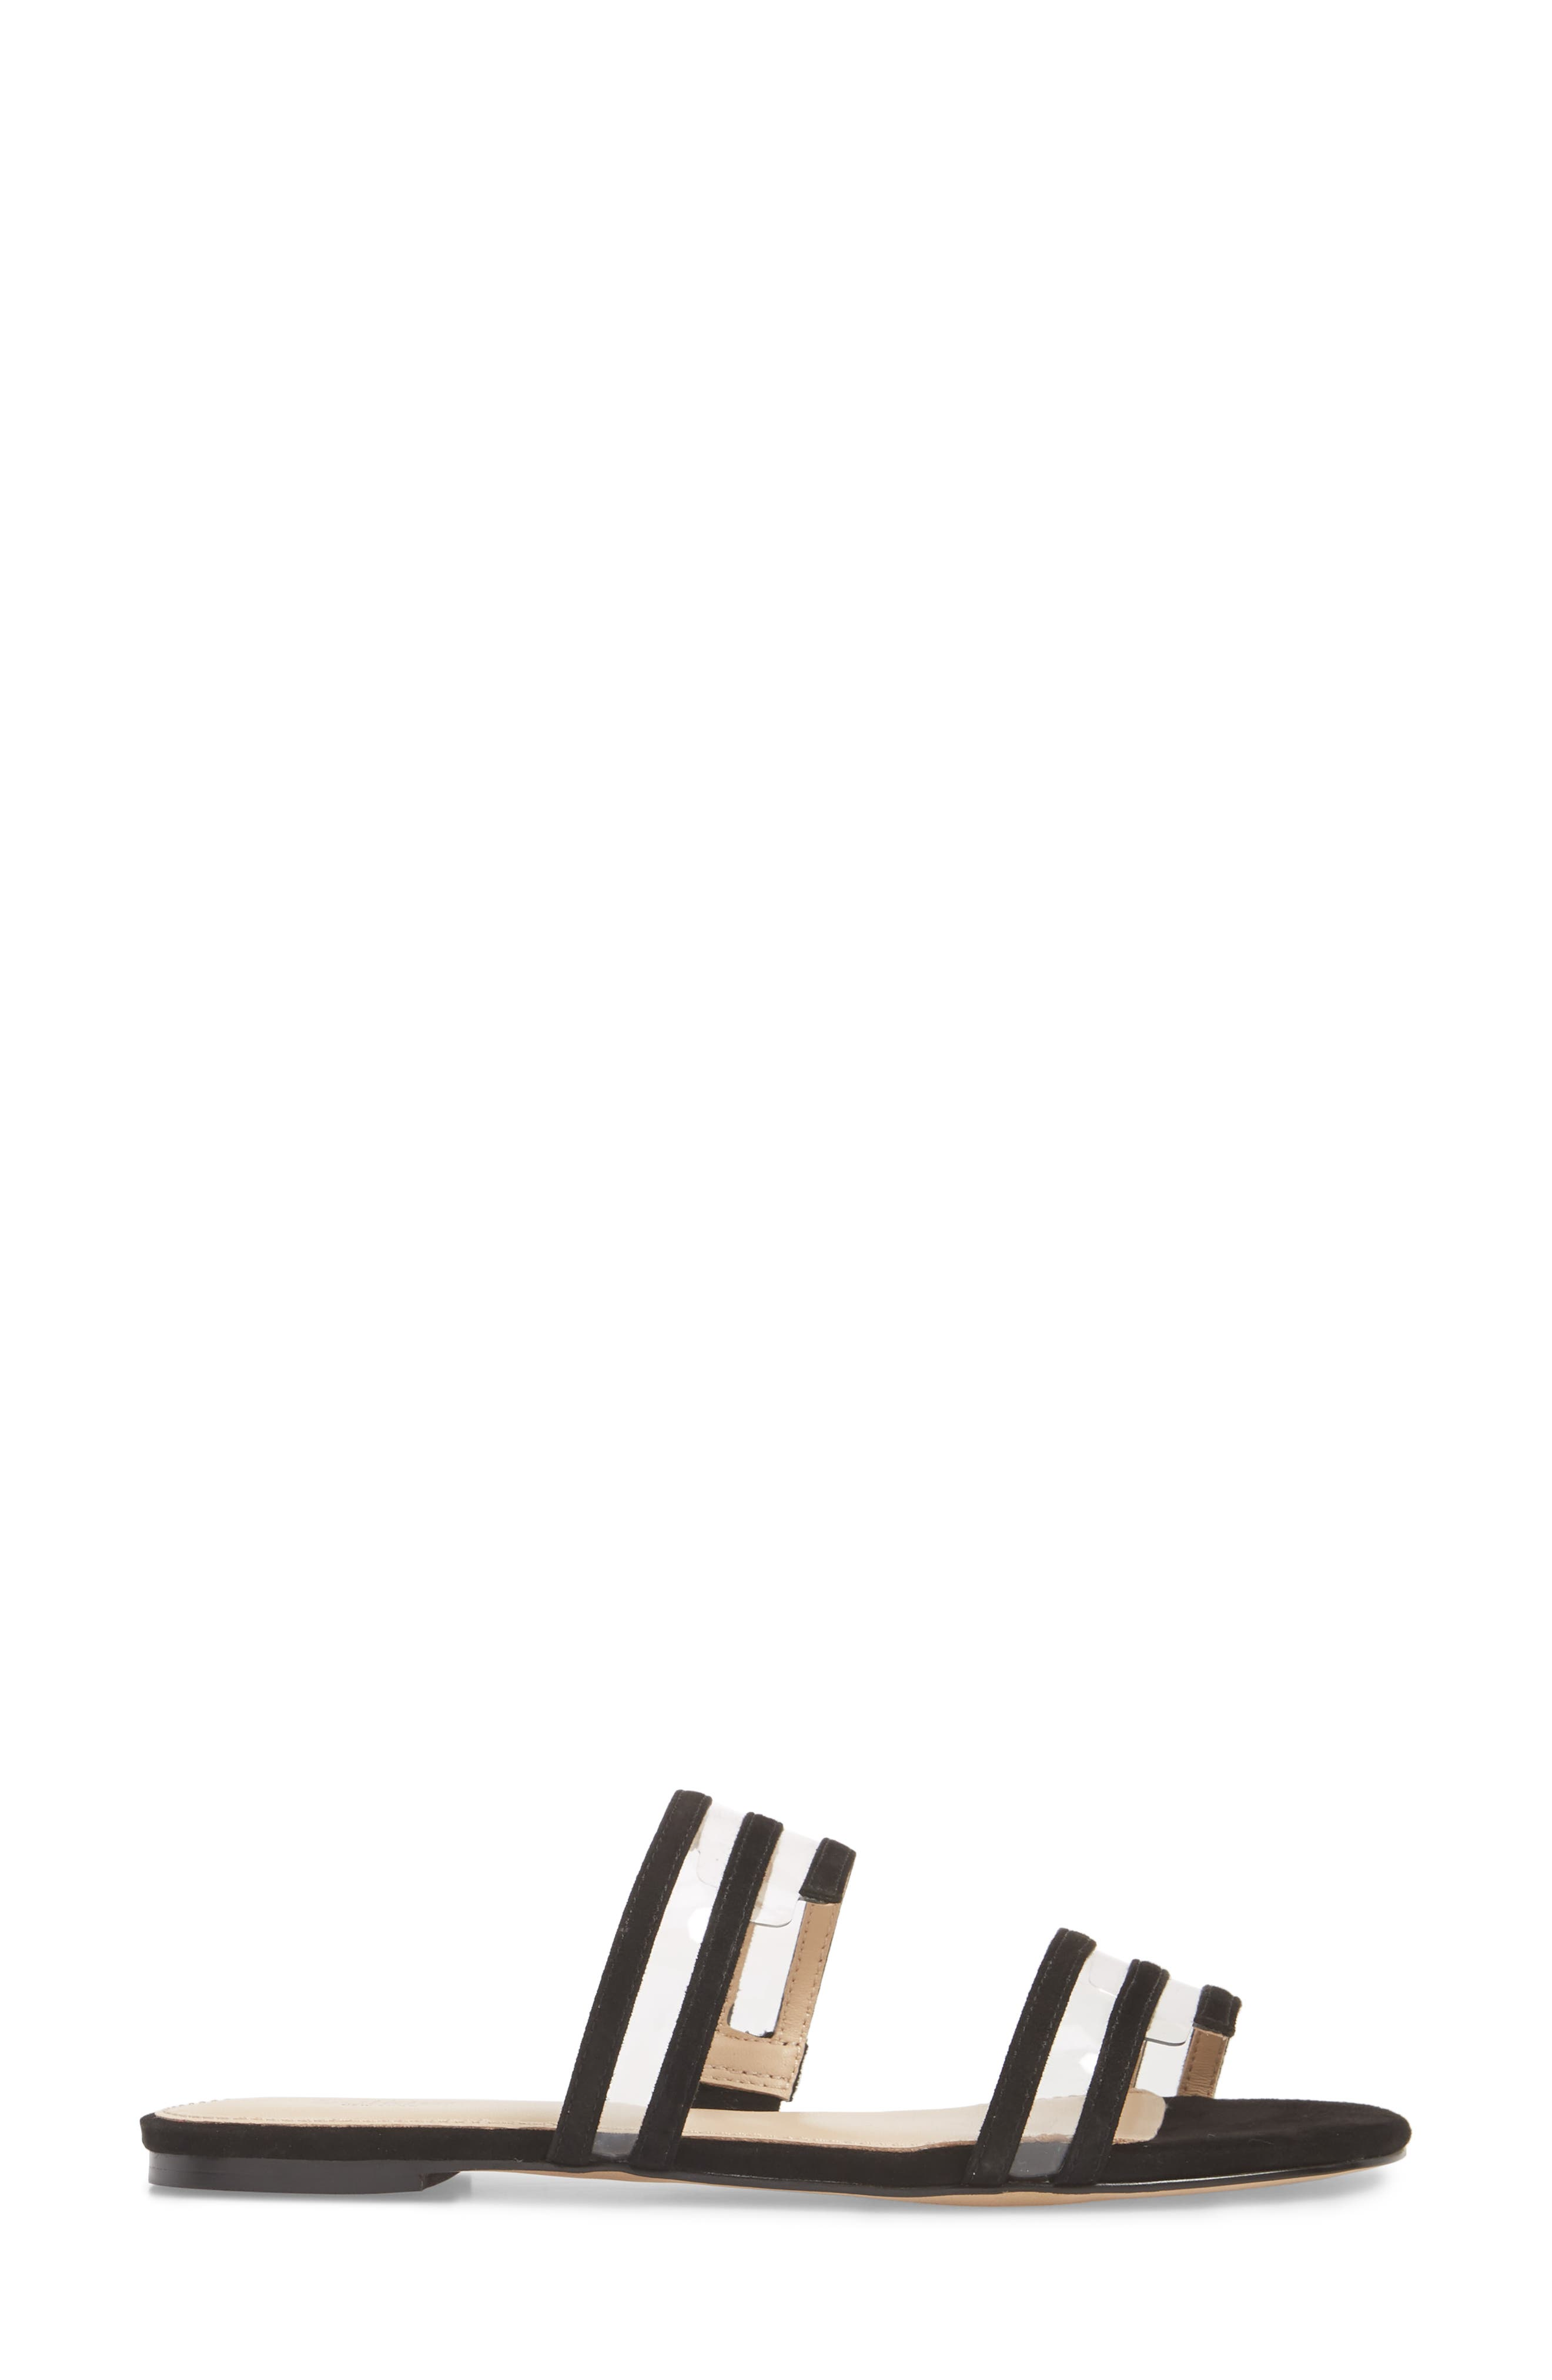 Maise Slide Sandal,                             Alternate thumbnail 3, color,                             BLACK SUEDE